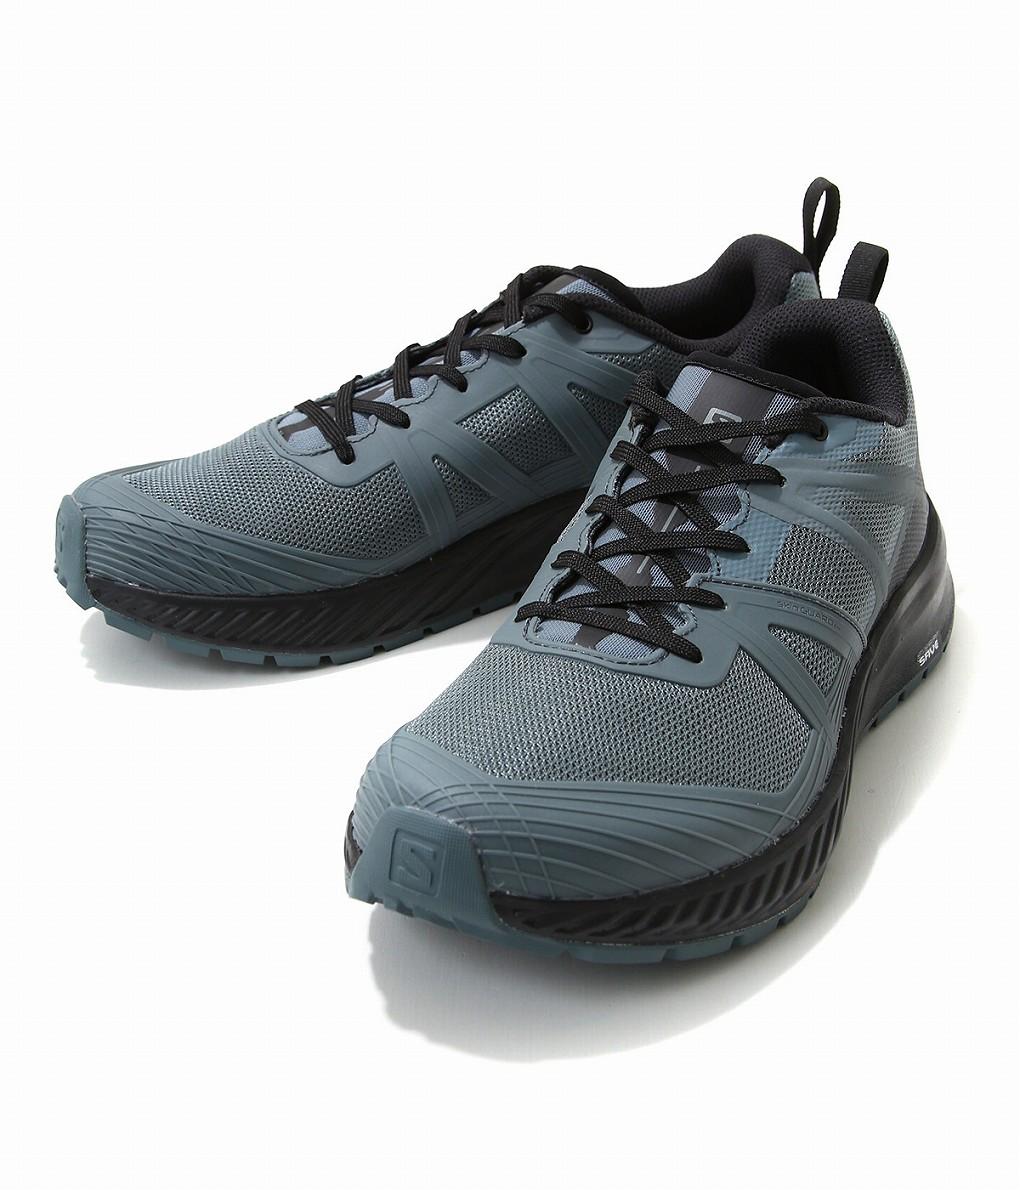 SALOMON Salomon: ODYSSEY TRIPLE CROWN: Salomon Odyssey triple crown colorful sneakers shoes shoes: L40685700